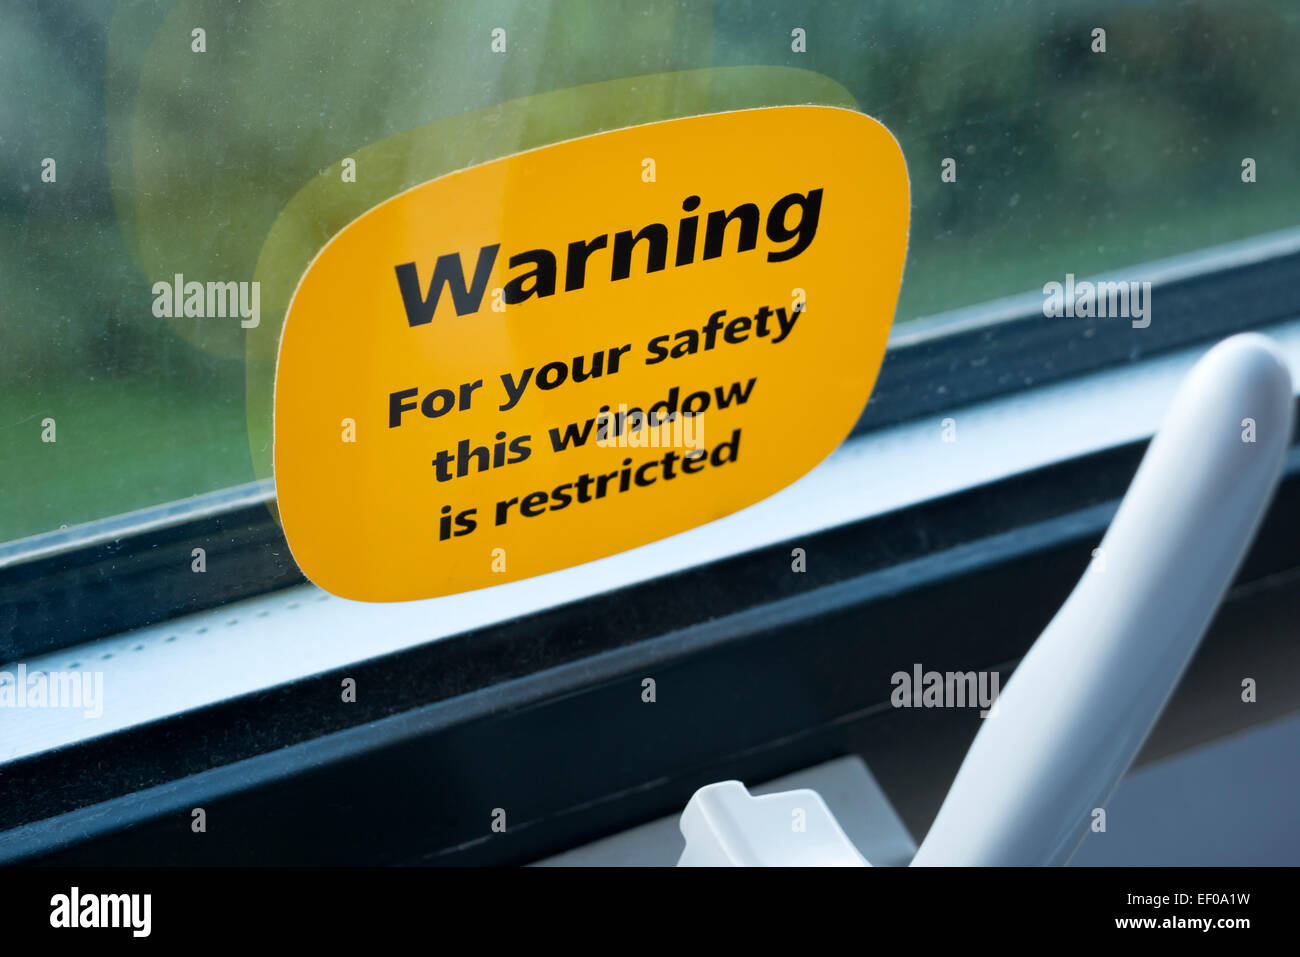 Warning sticker on restricted window